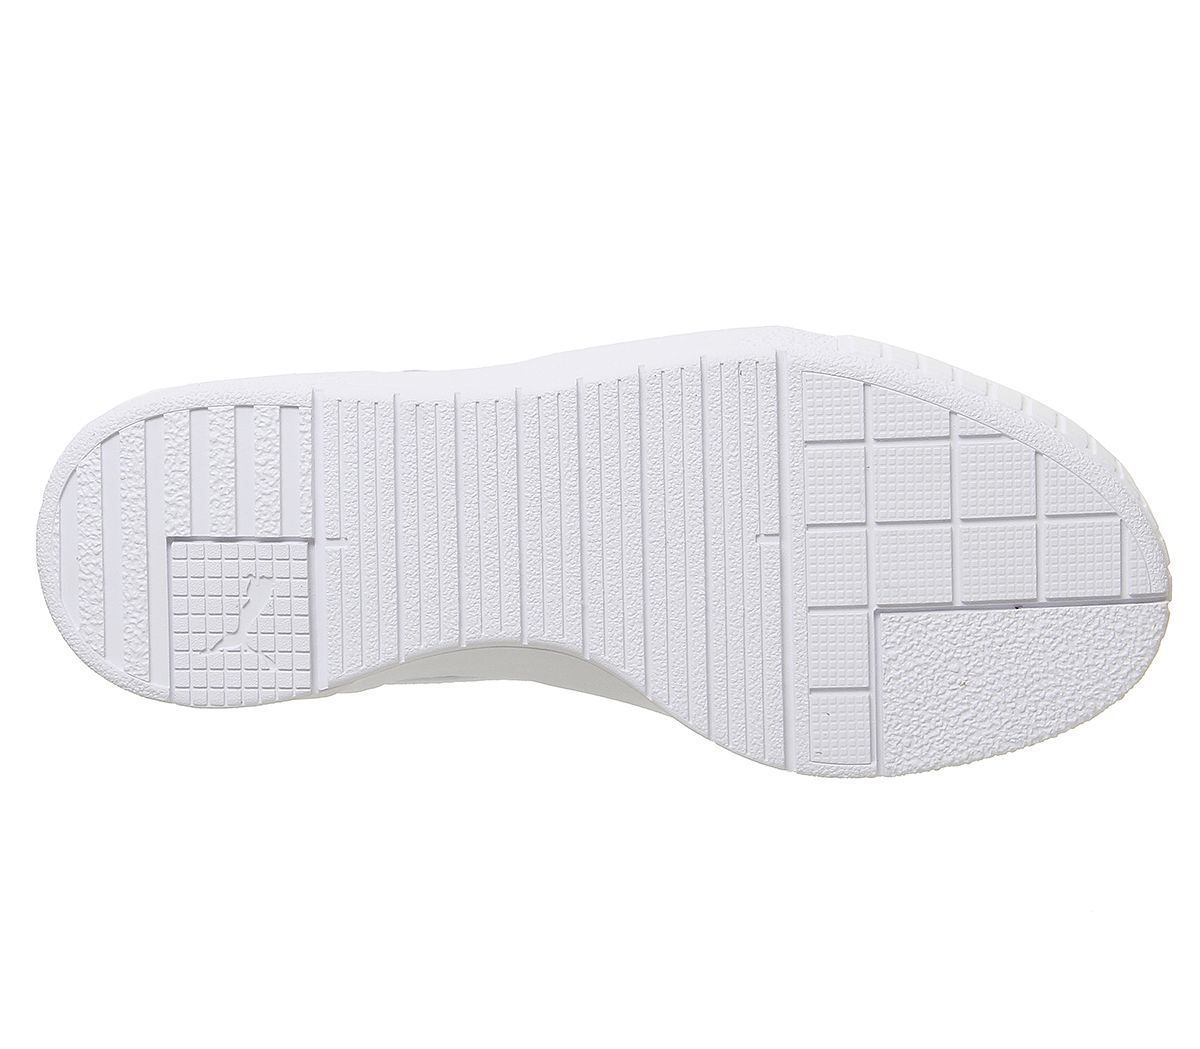 Chaussures-Femme-Puma-Cali-Sport-Baskets-Blanc-Baskets-Chaussures miniature 5